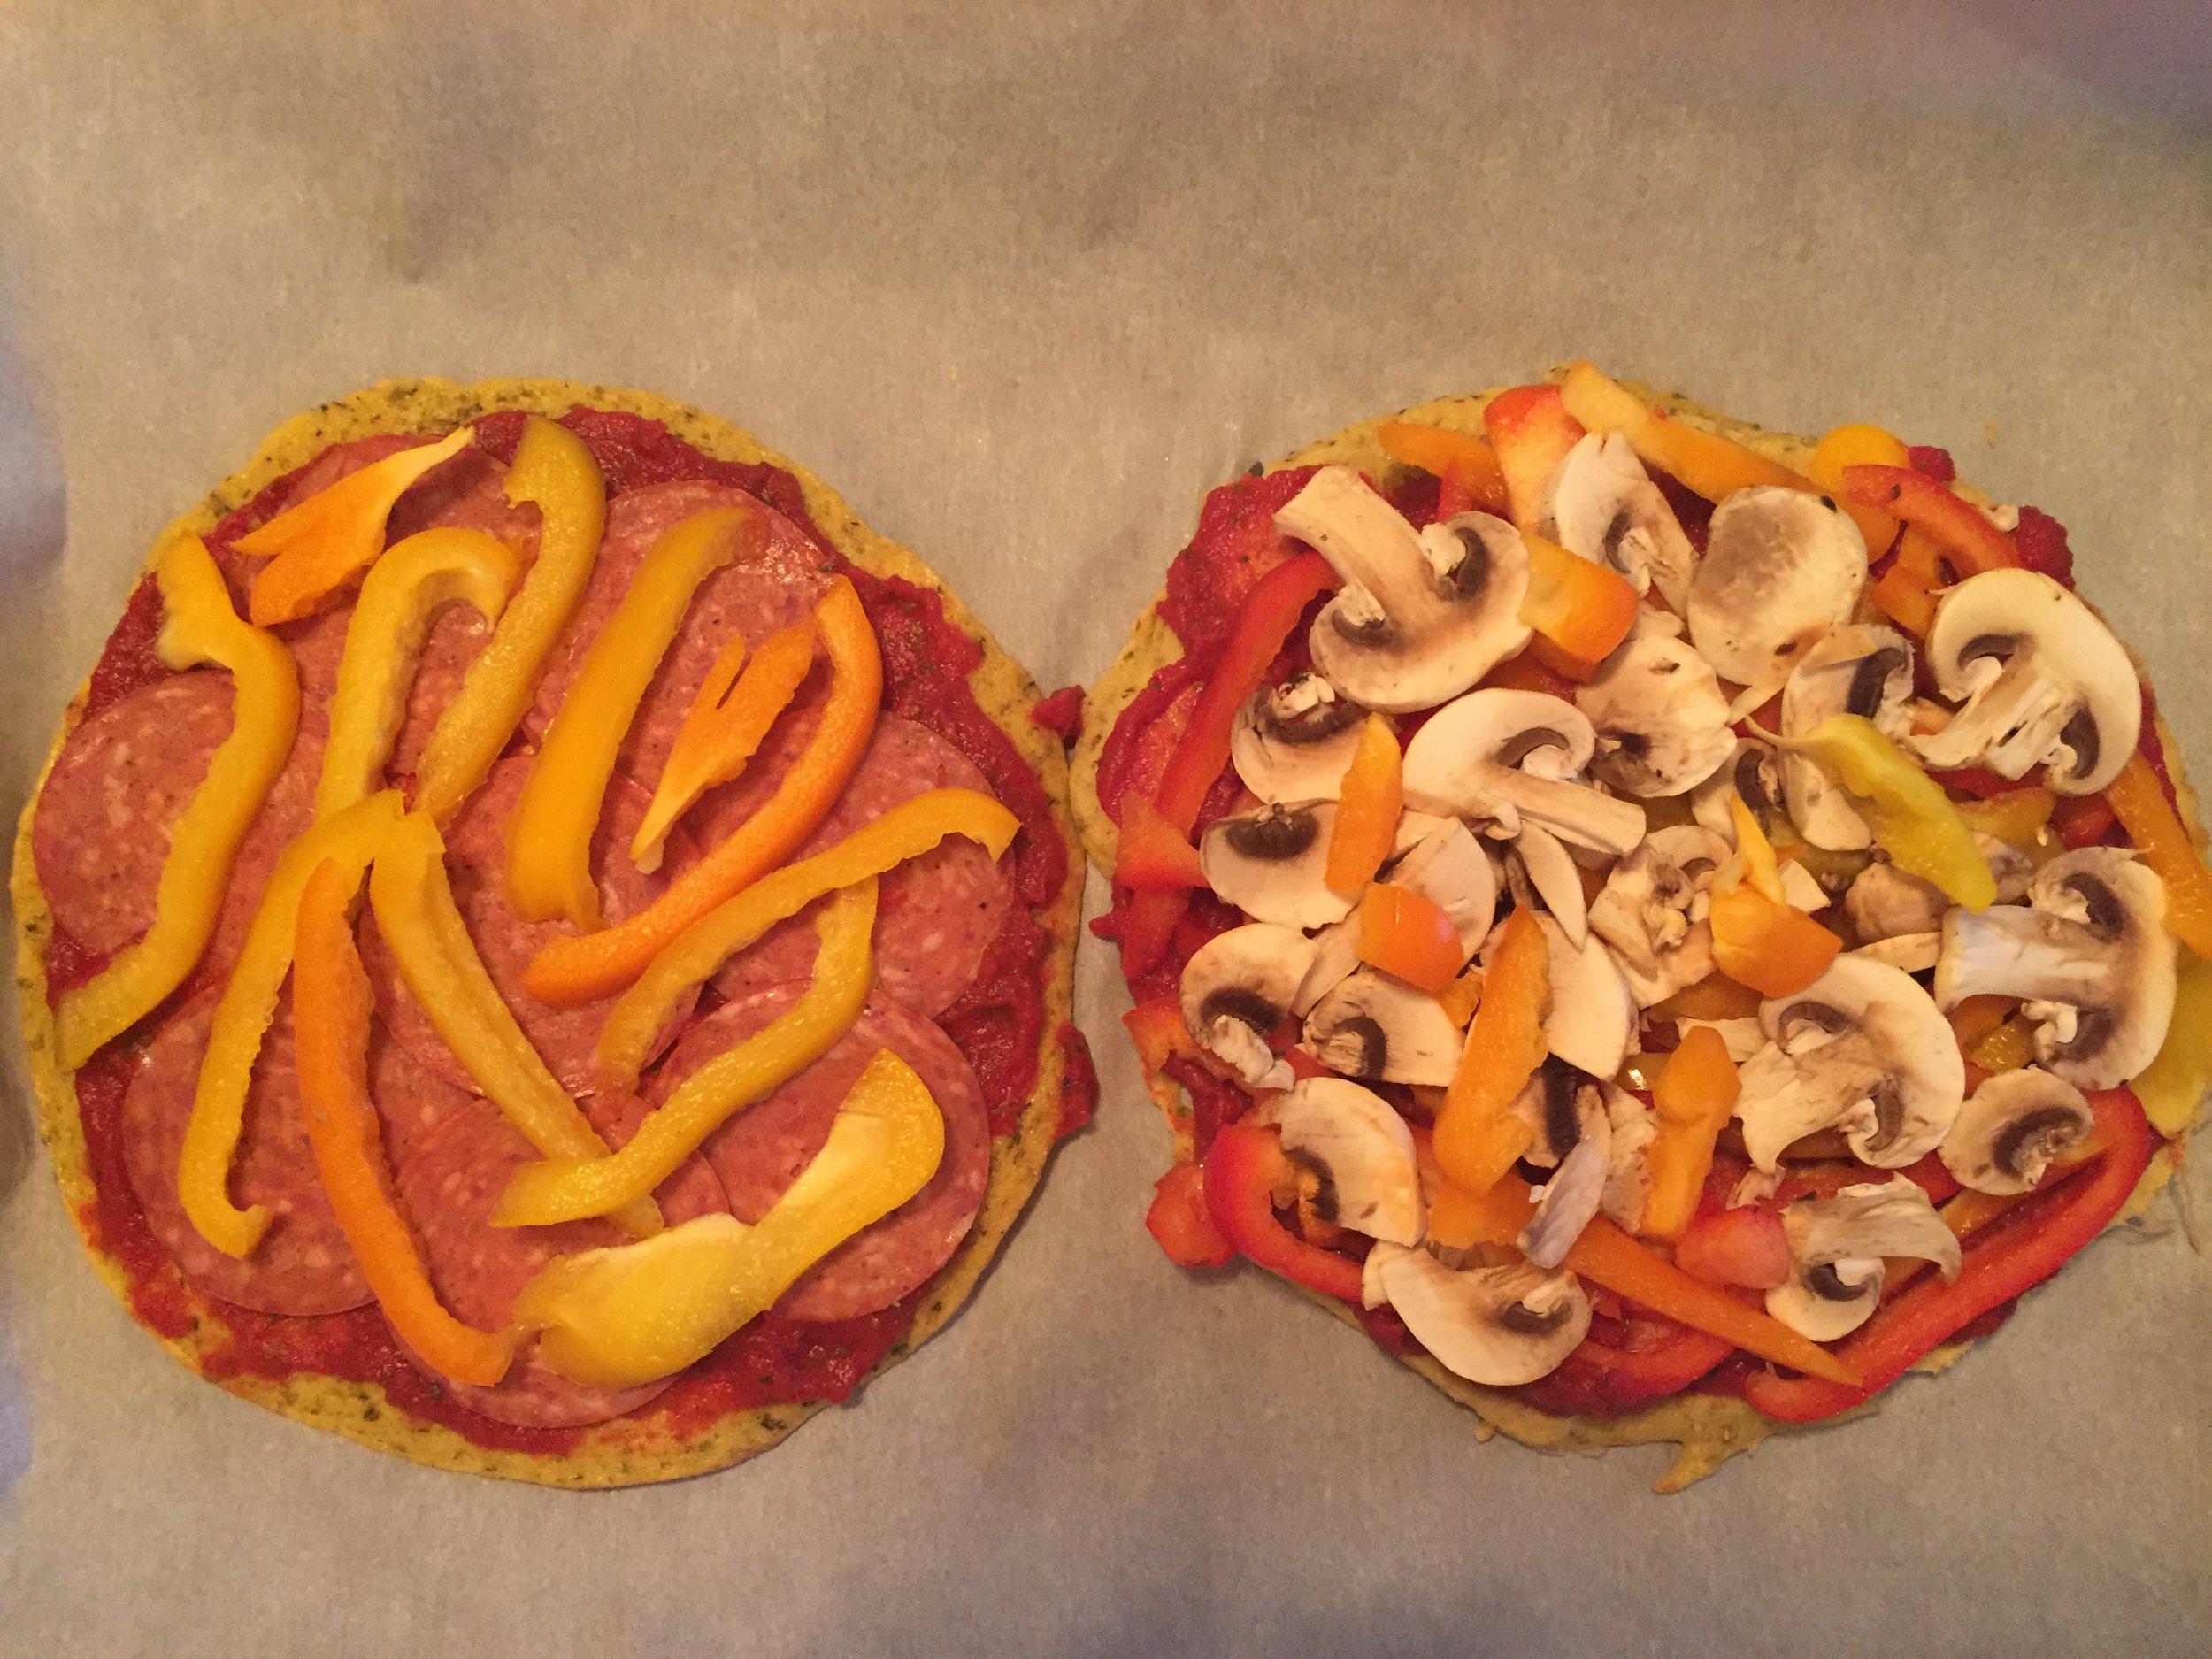 Pizza.Keto.MaNaturopathe.com